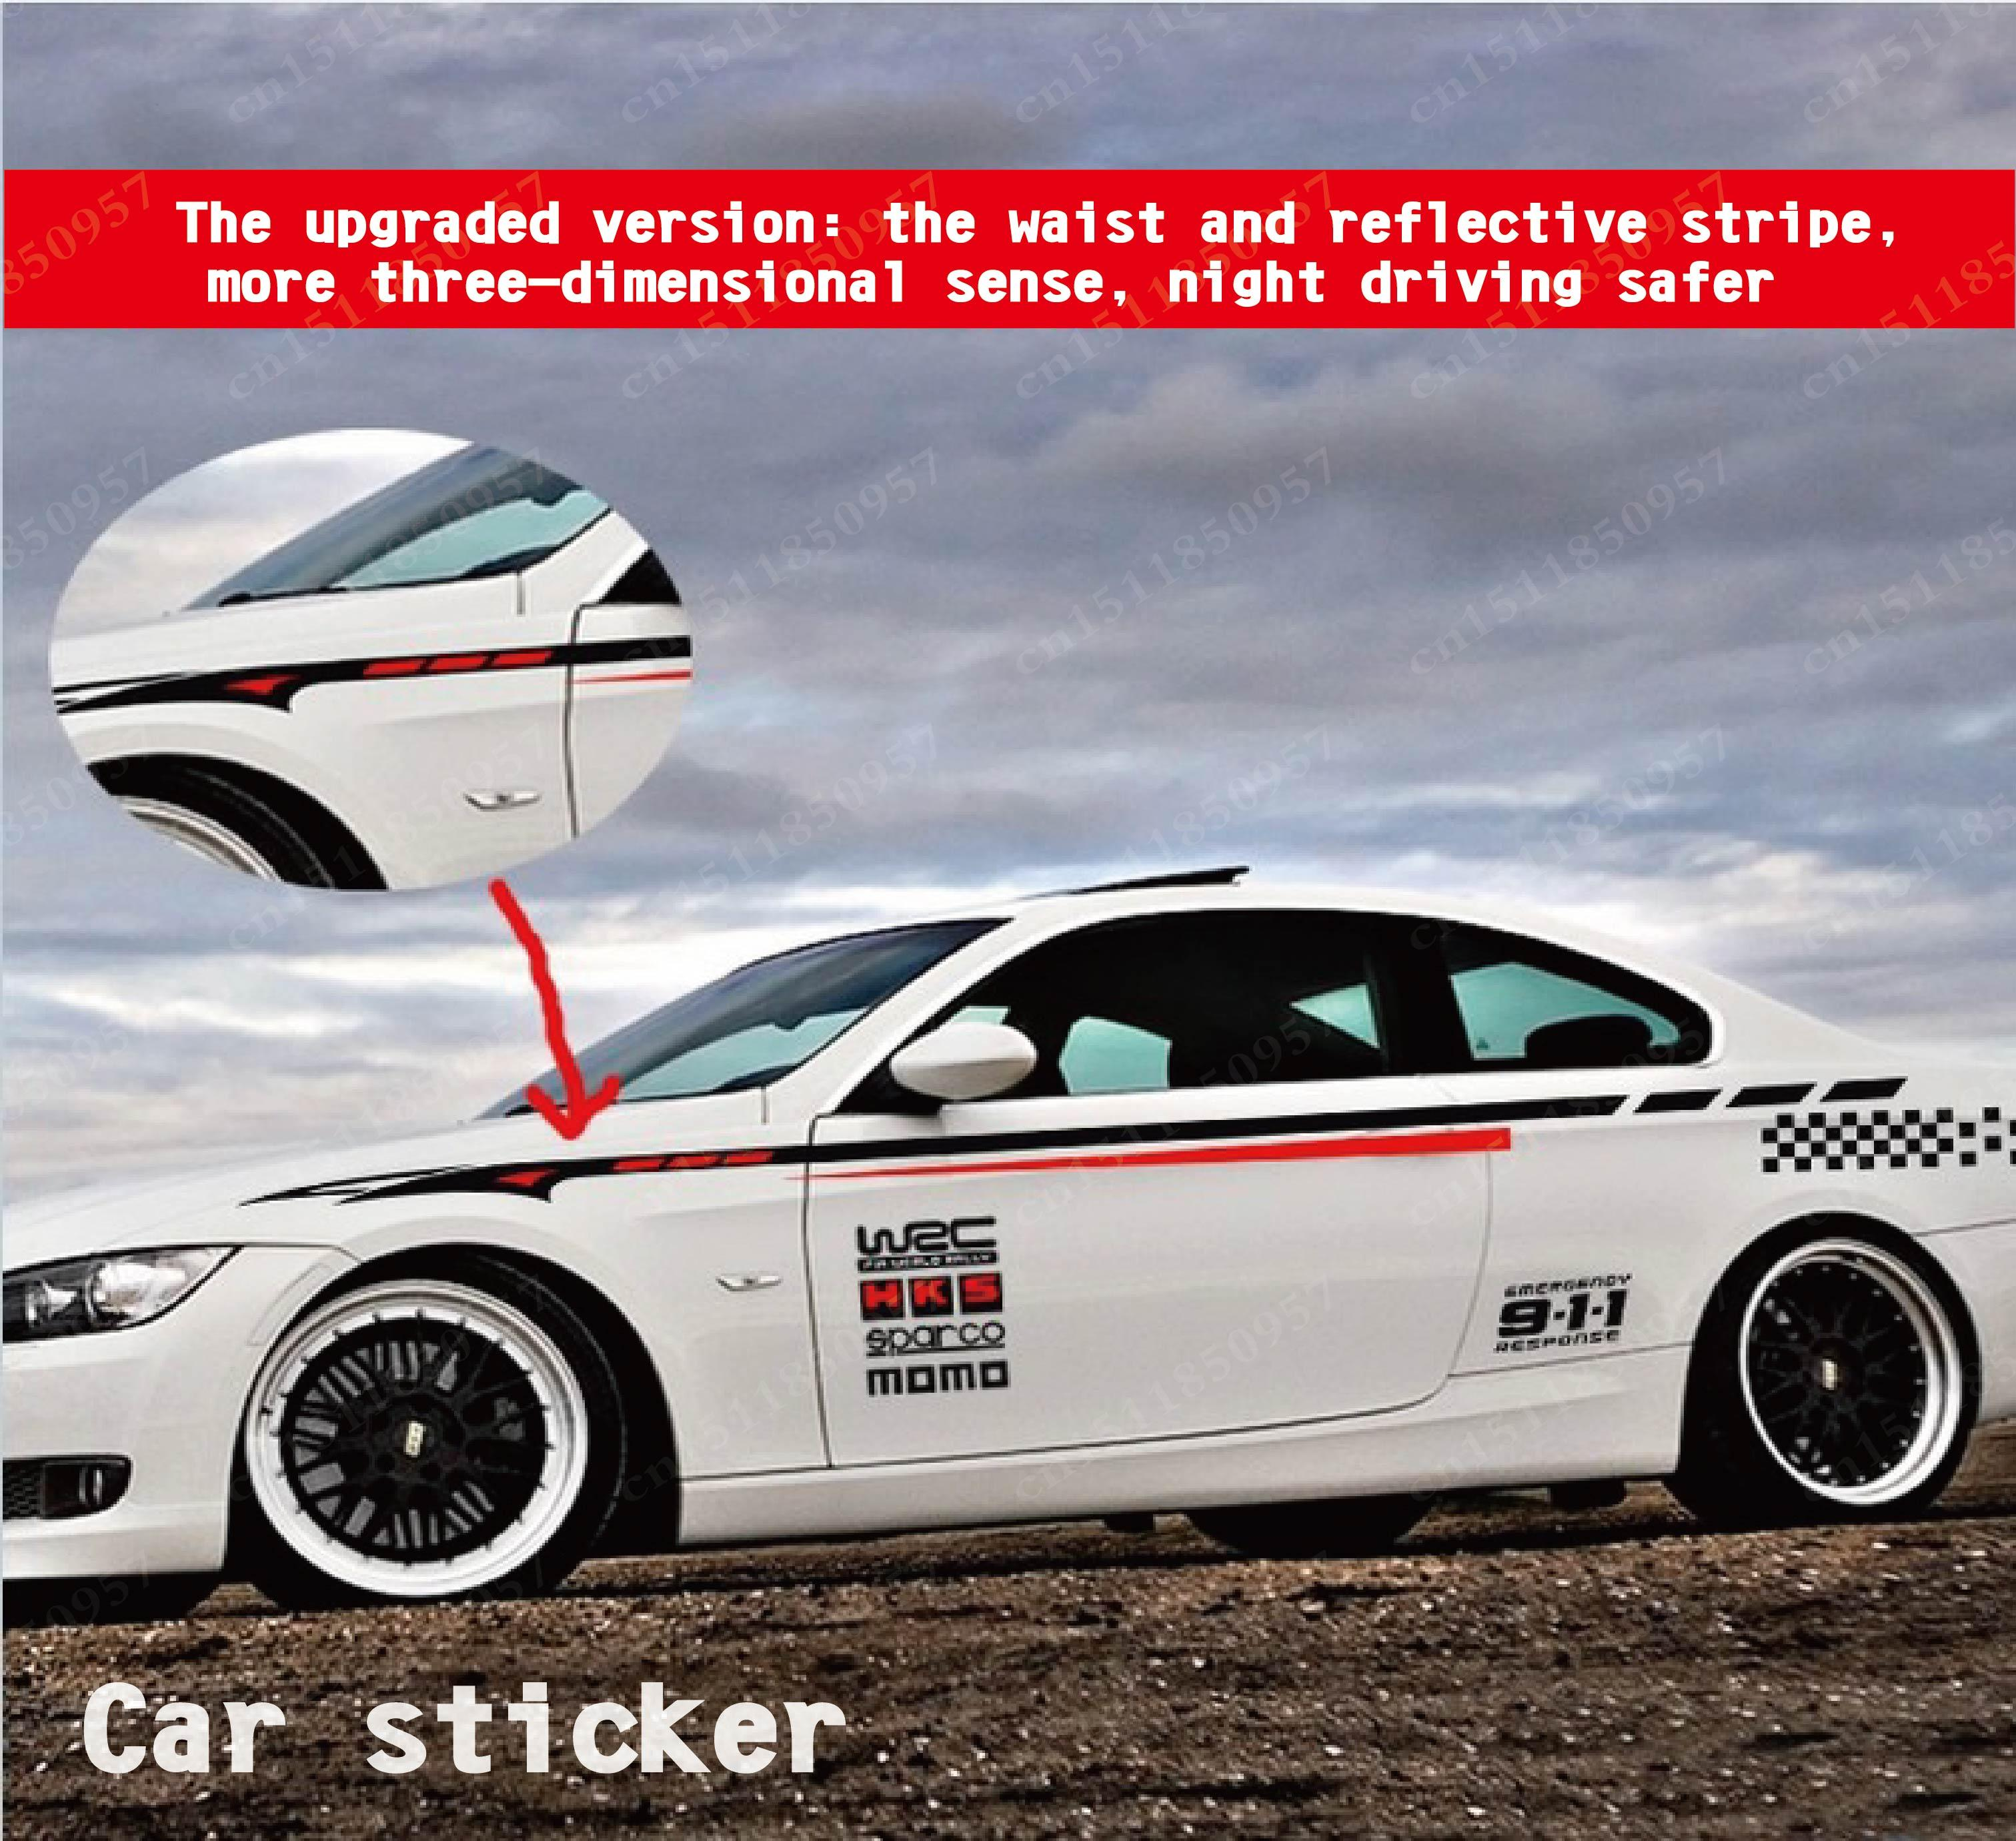 Car sticker maker app - Car Sticker Maker App 0